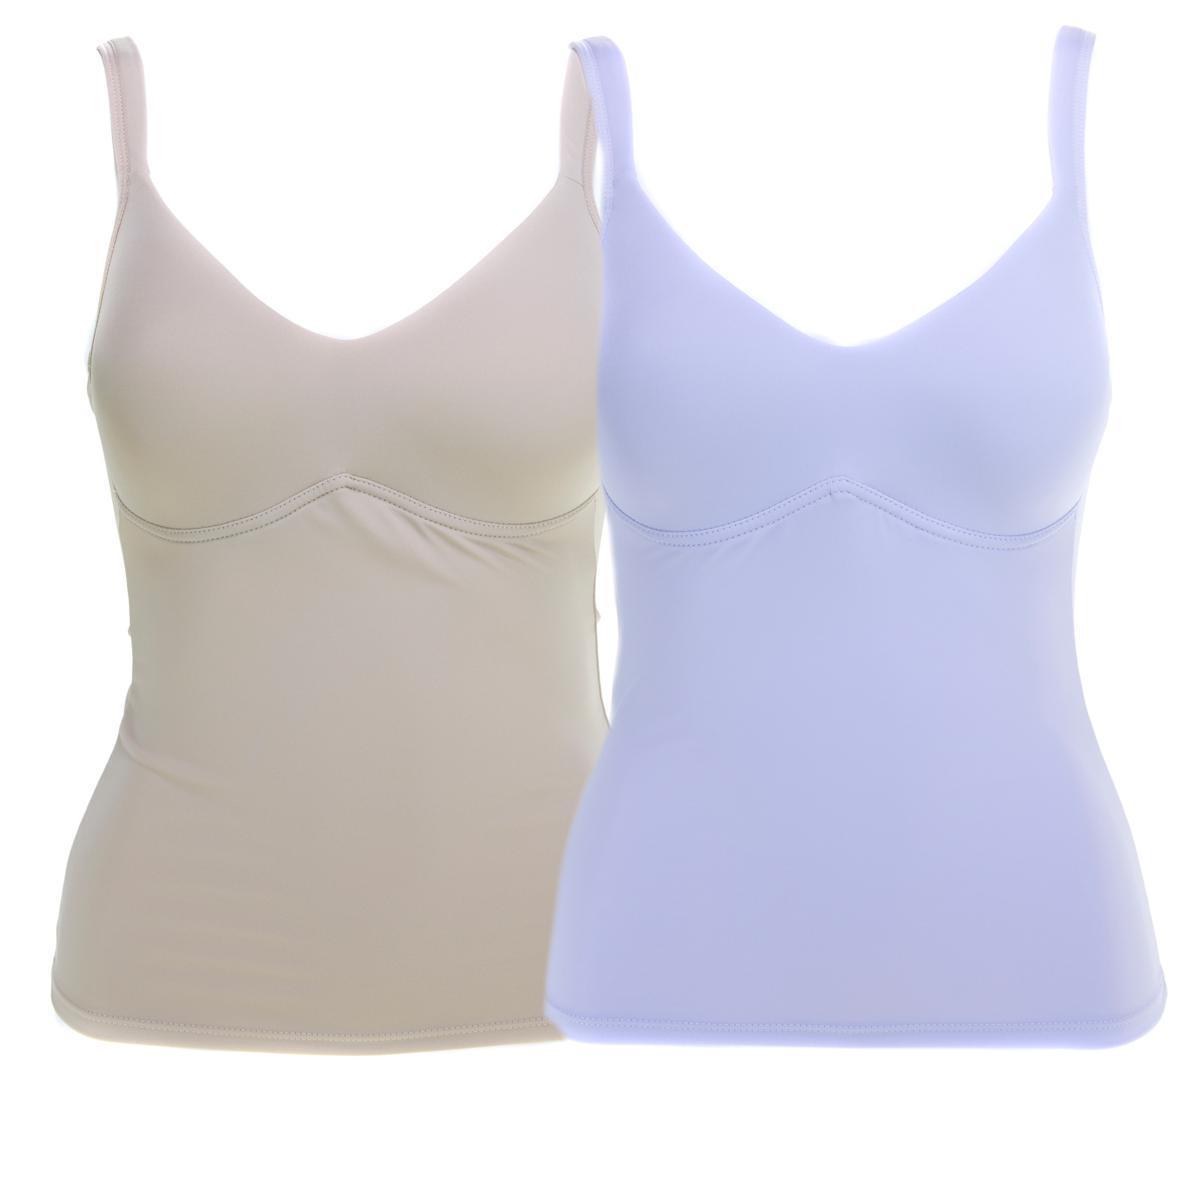 Rhonda Shear Everyday Molded Cup 2pk Camisole, Nude/Purple Heather, S (586-078)